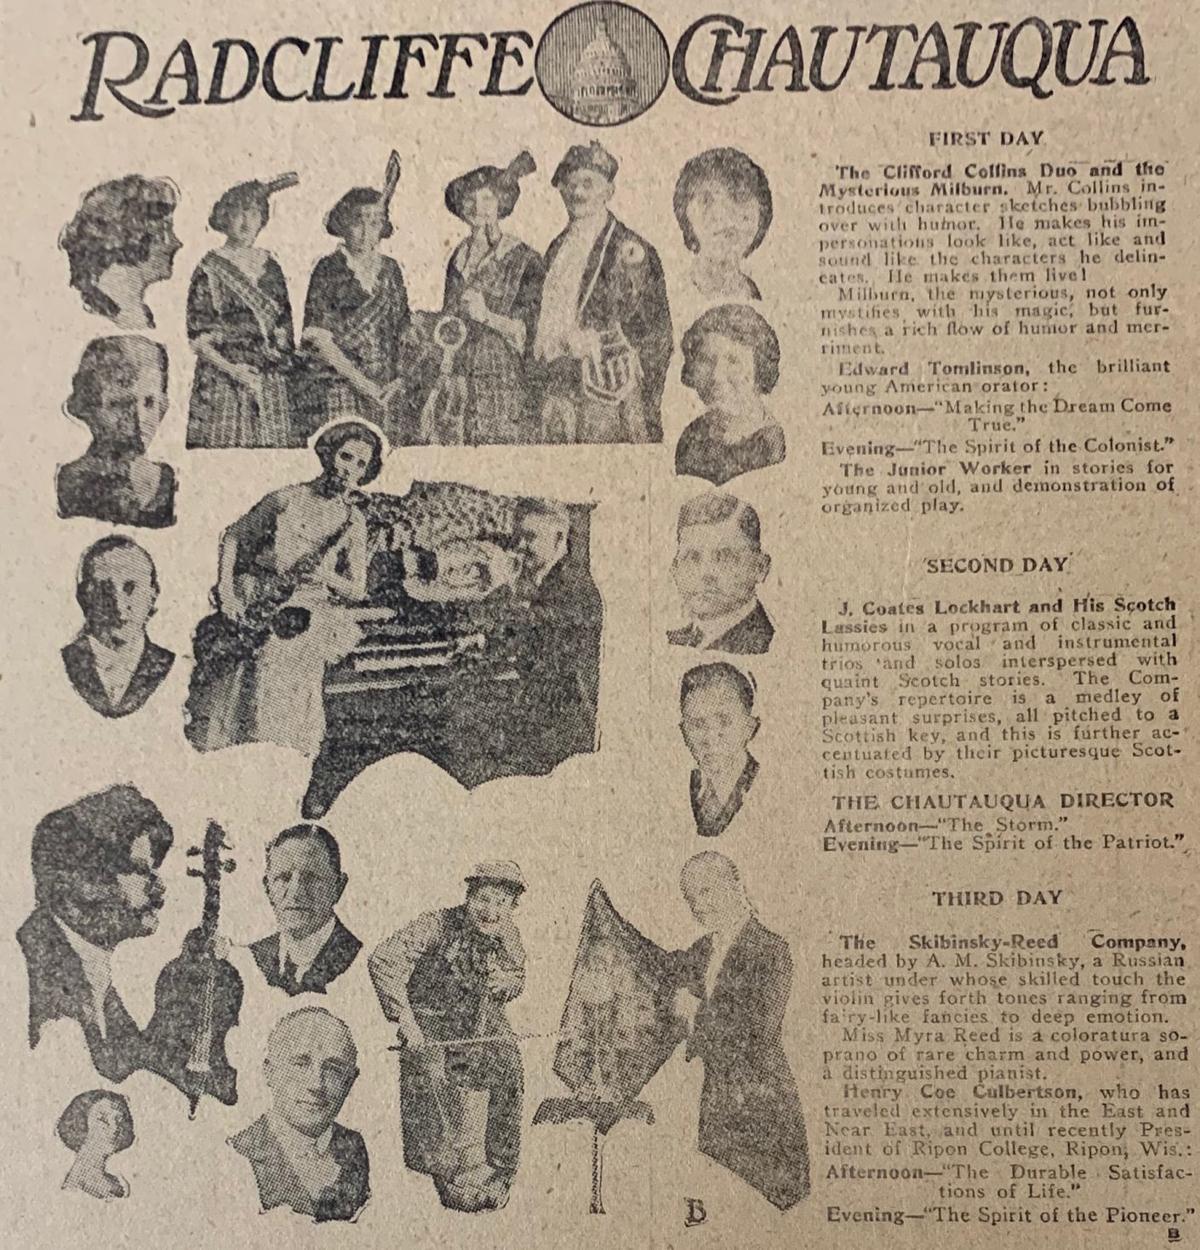 Radcliffe Chautauqua 1922